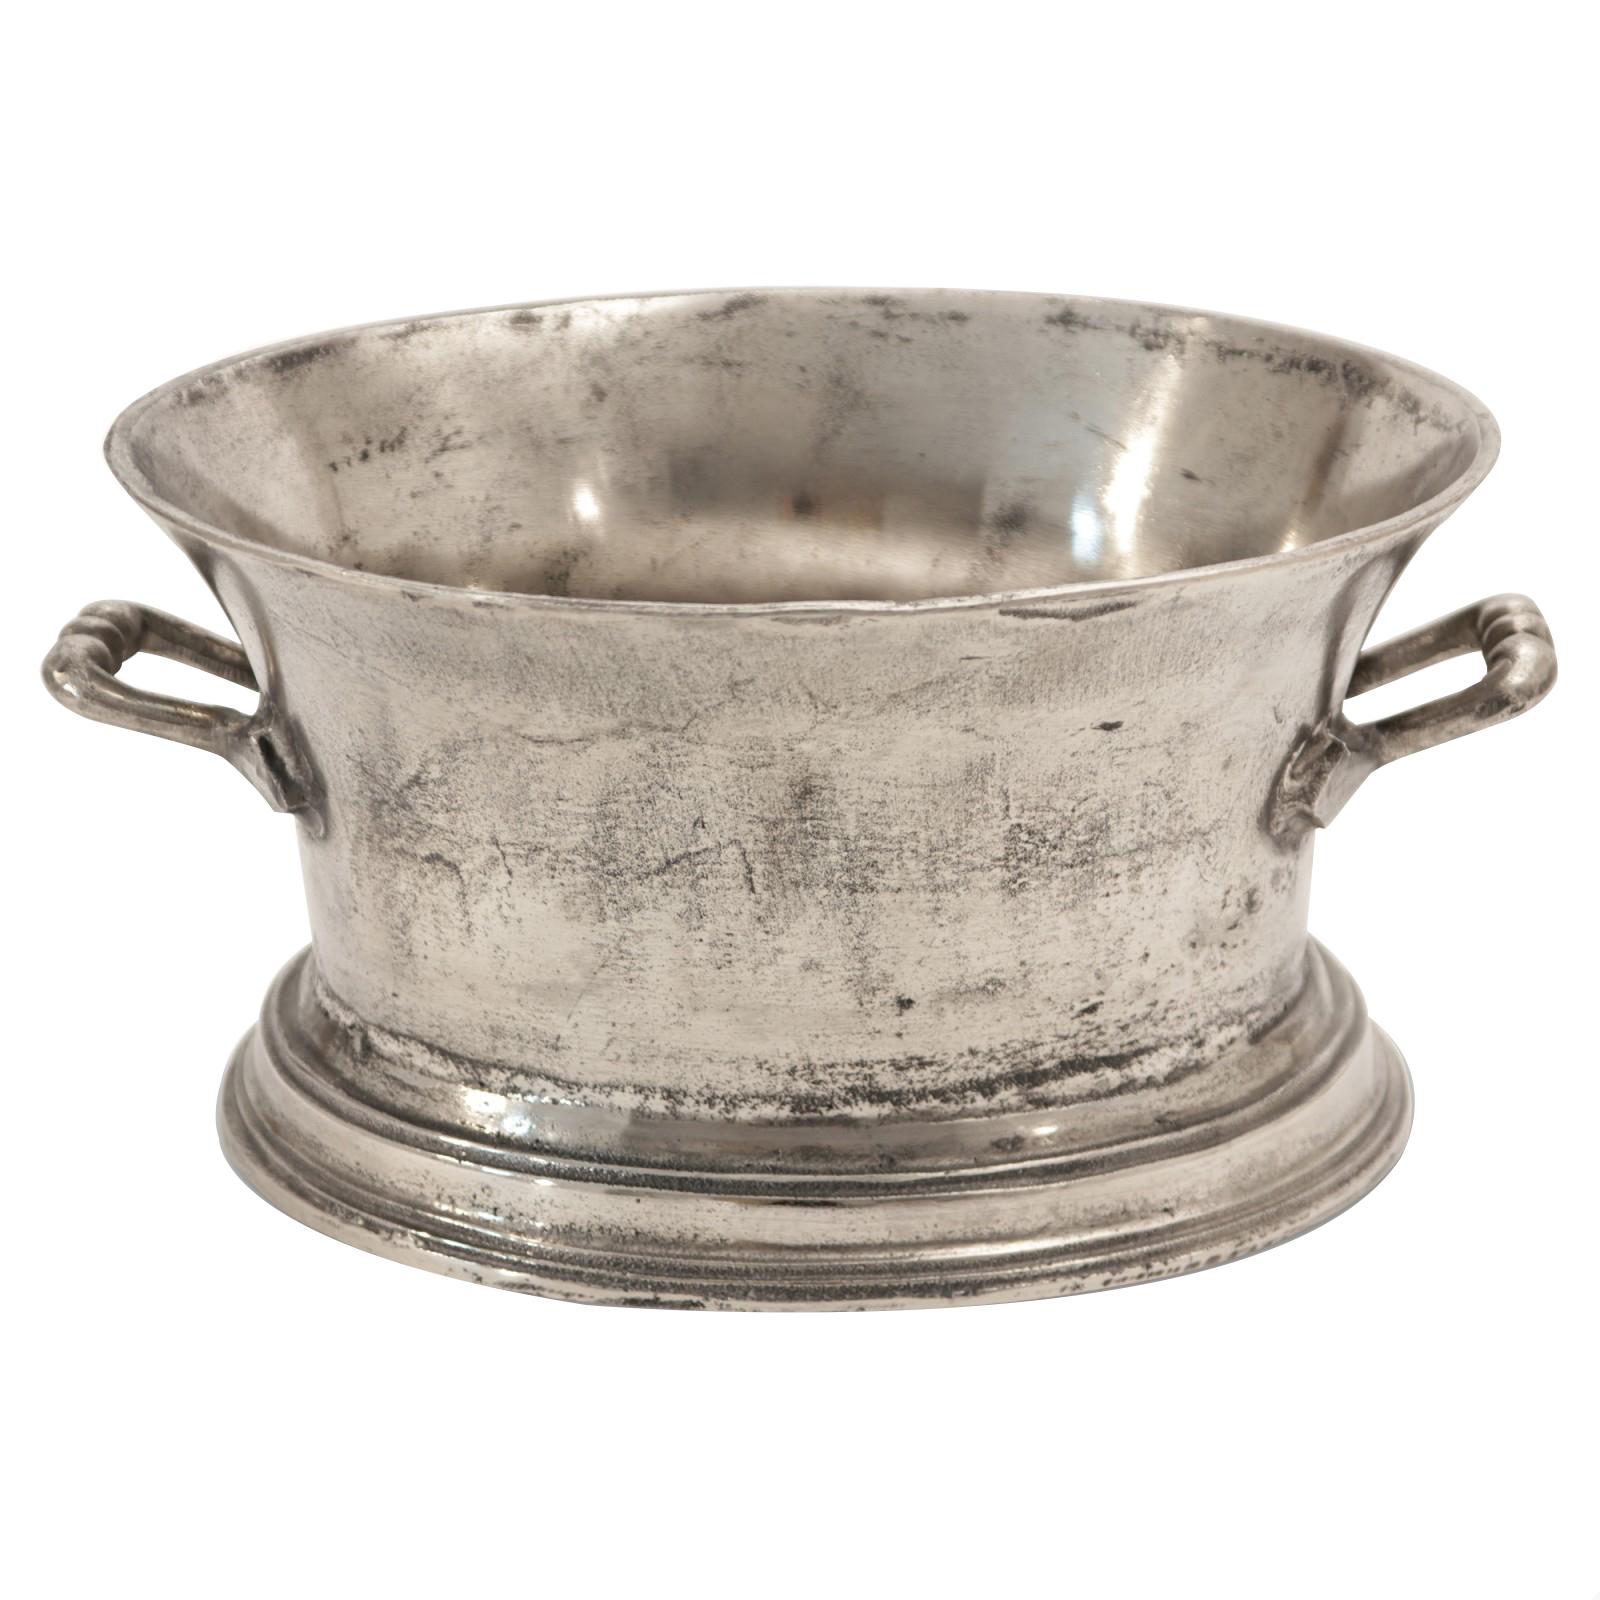 Belgravia Epernay Champagne Bucket 1 1